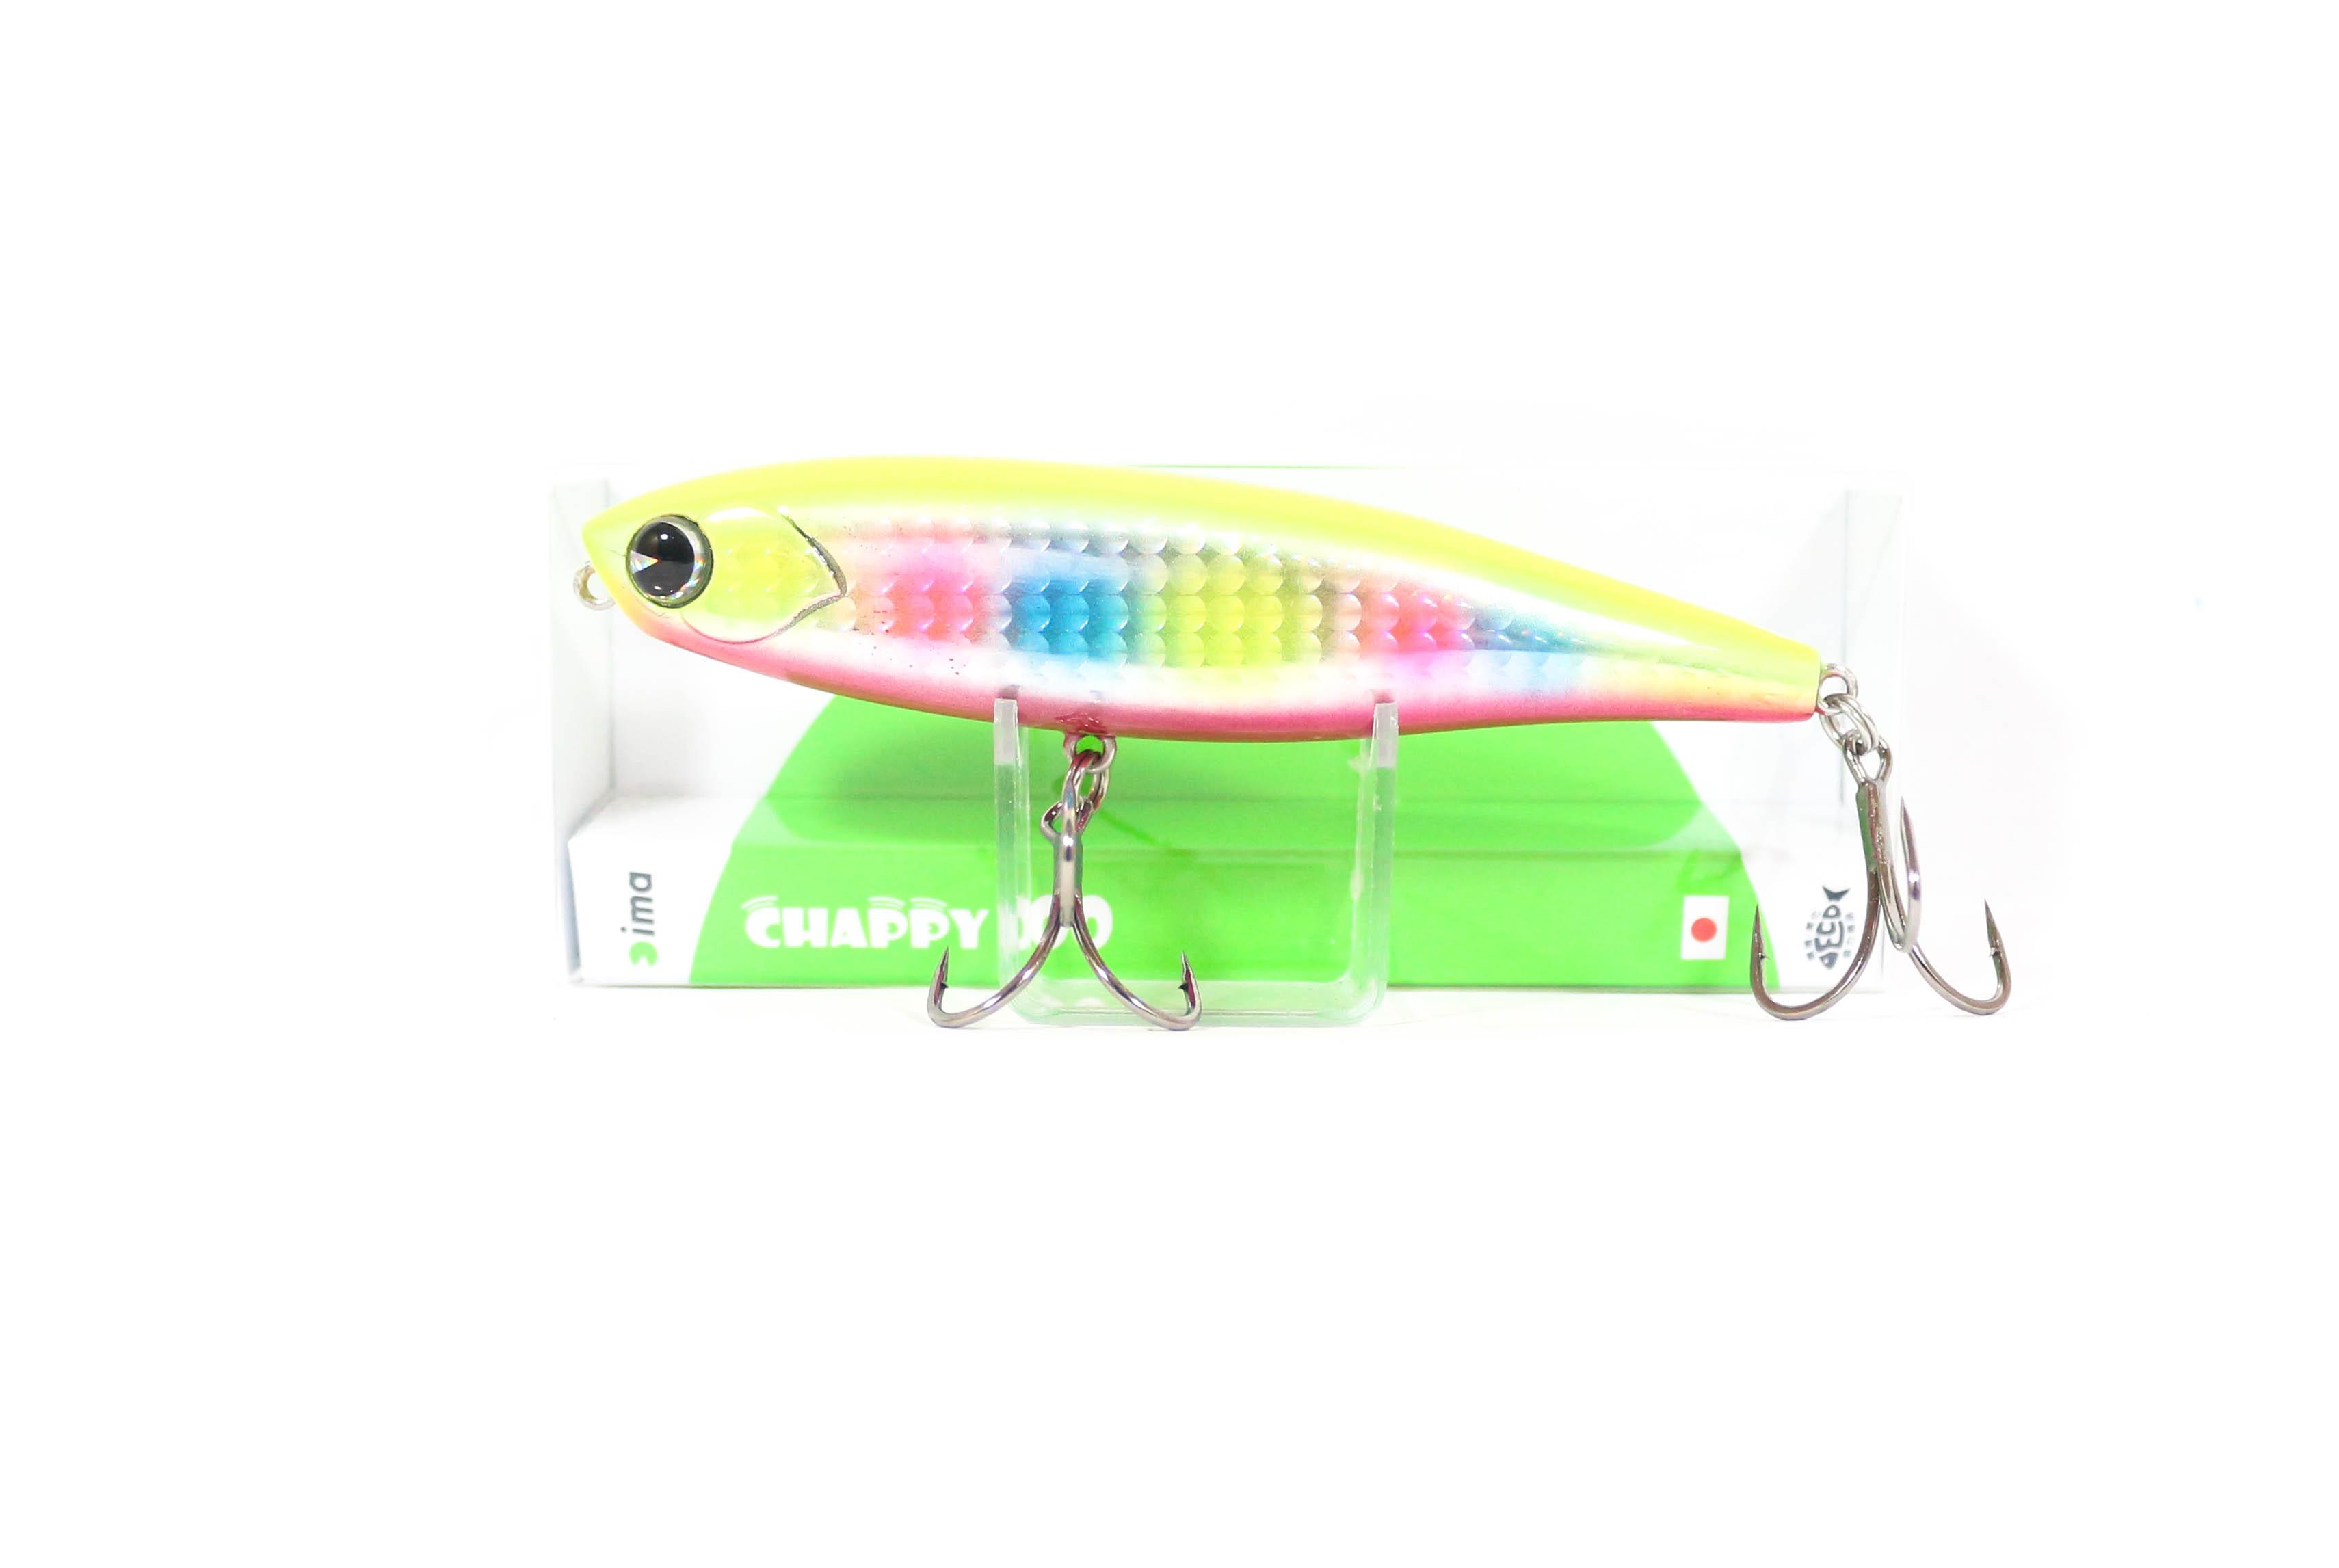 Ima Chappy 100 Floating Lure 09 (4660)